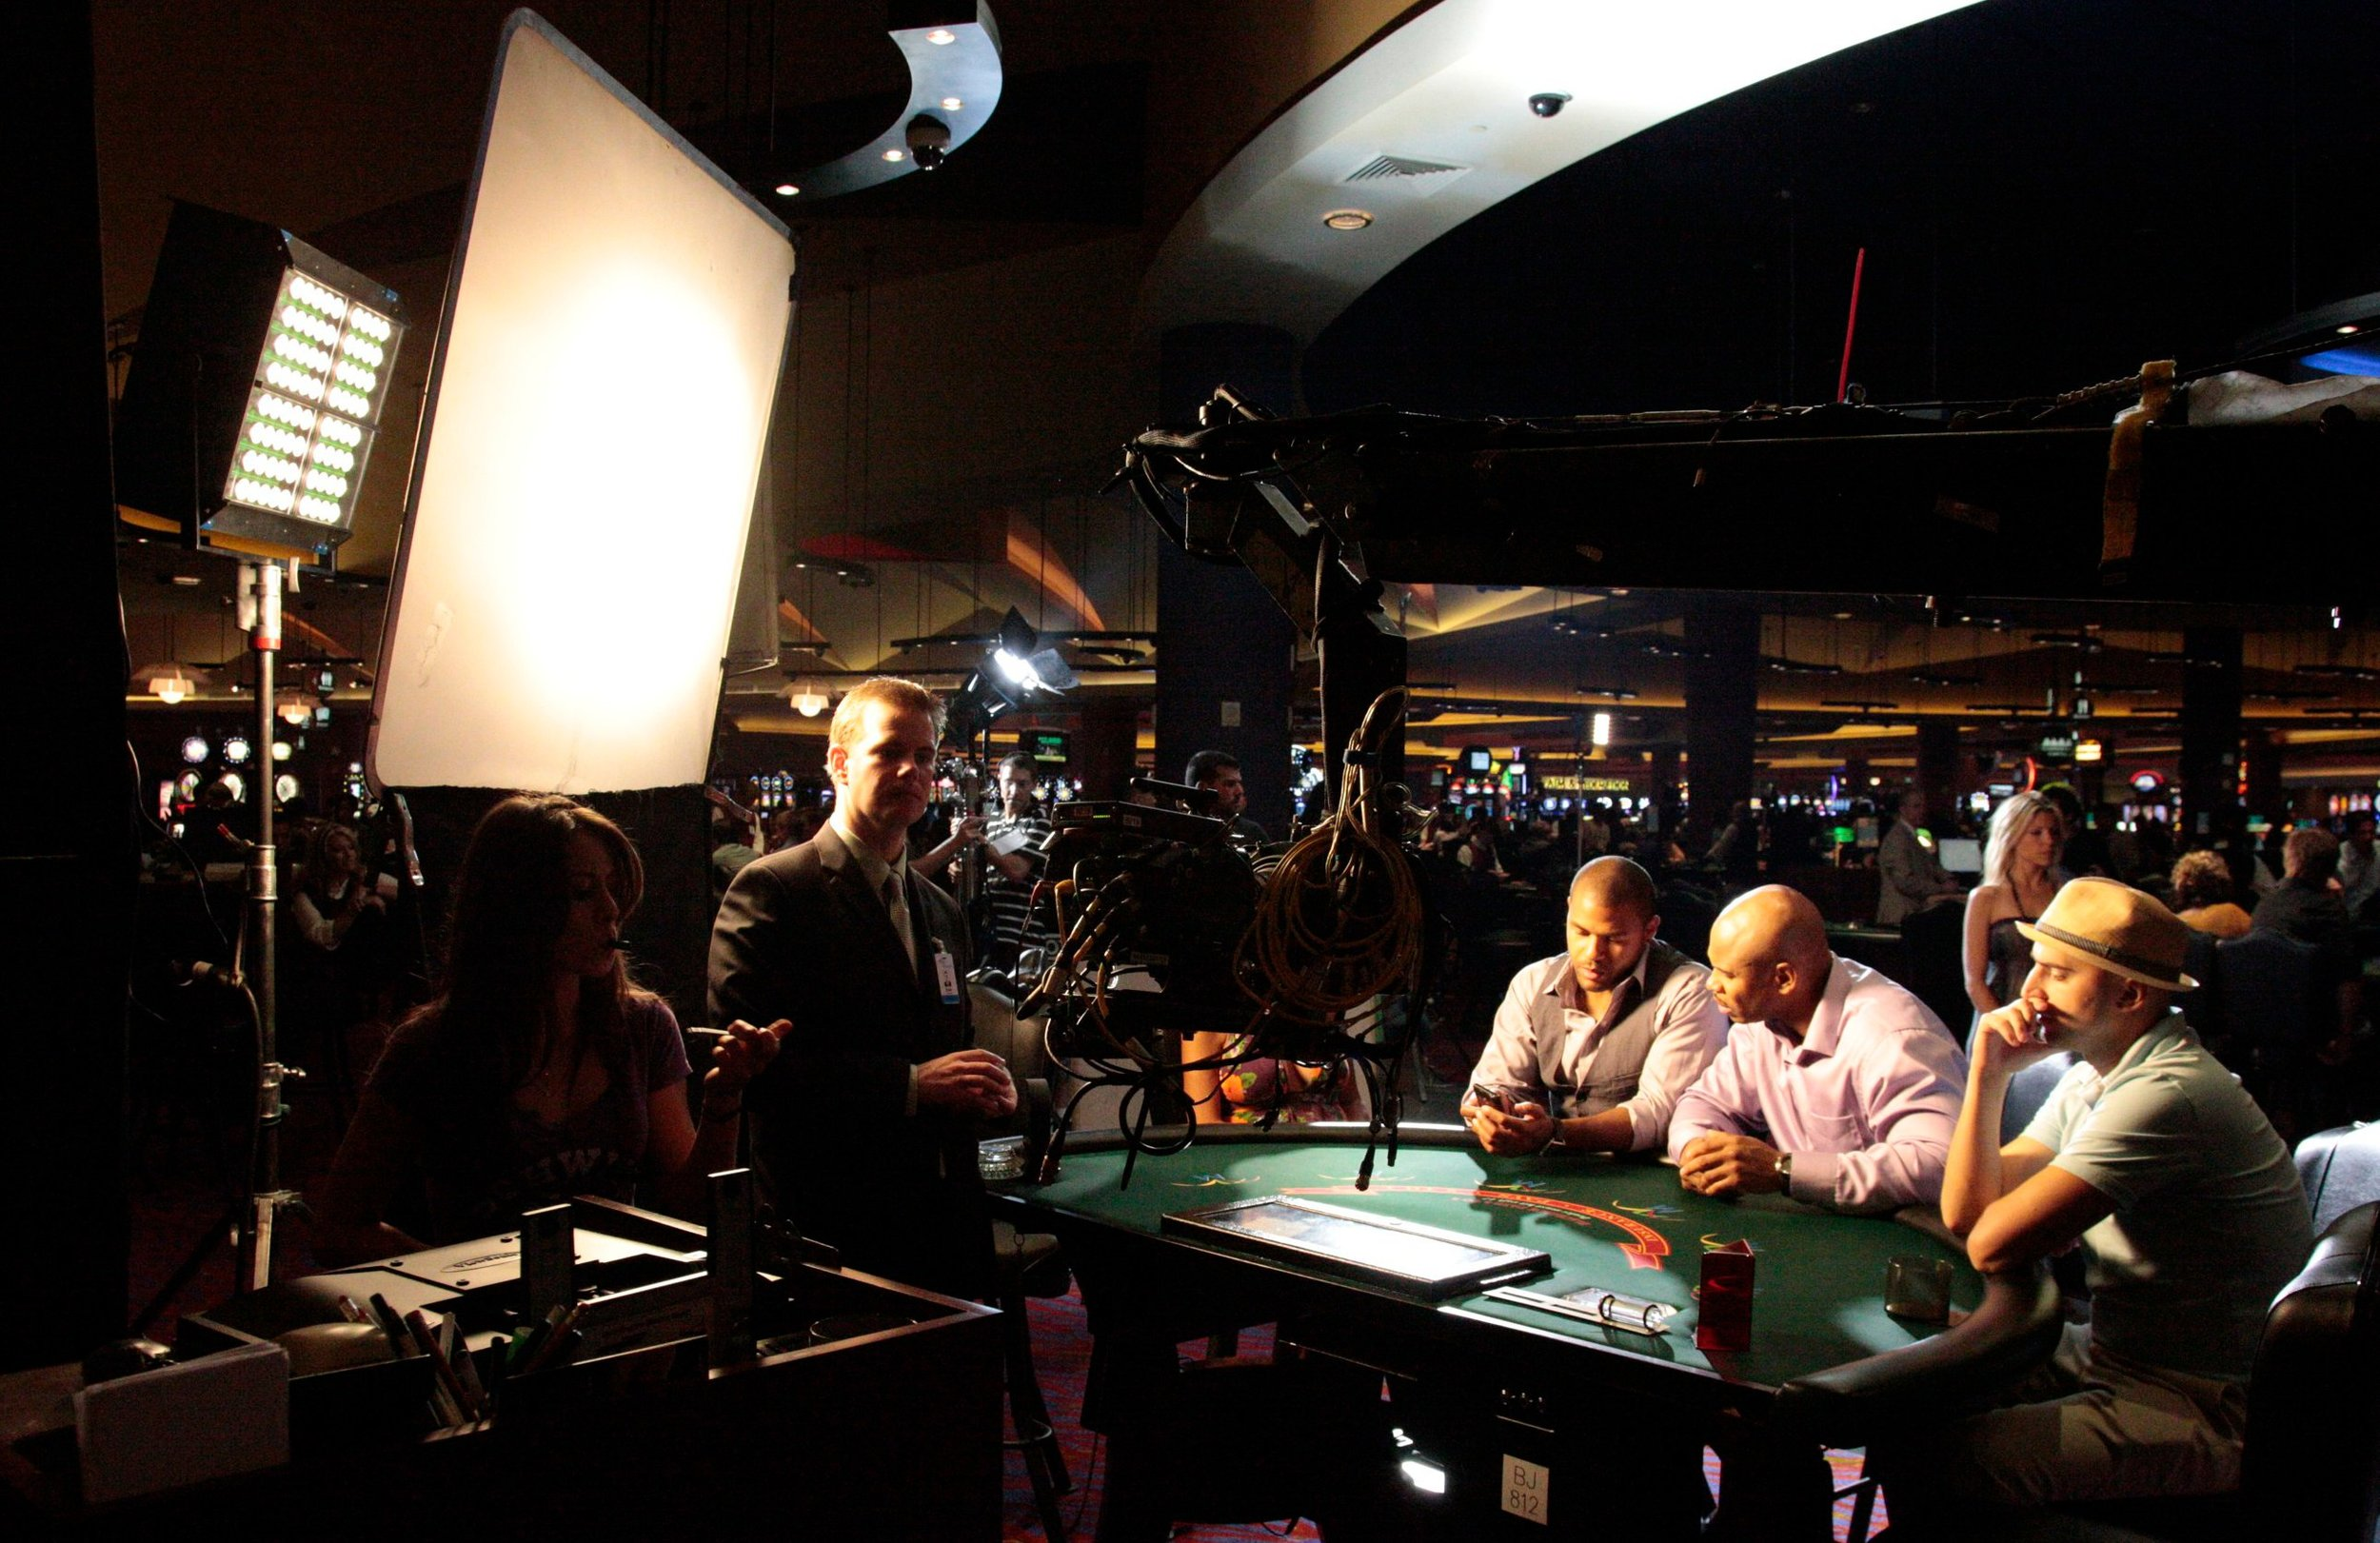 Morongo Casino Commercial